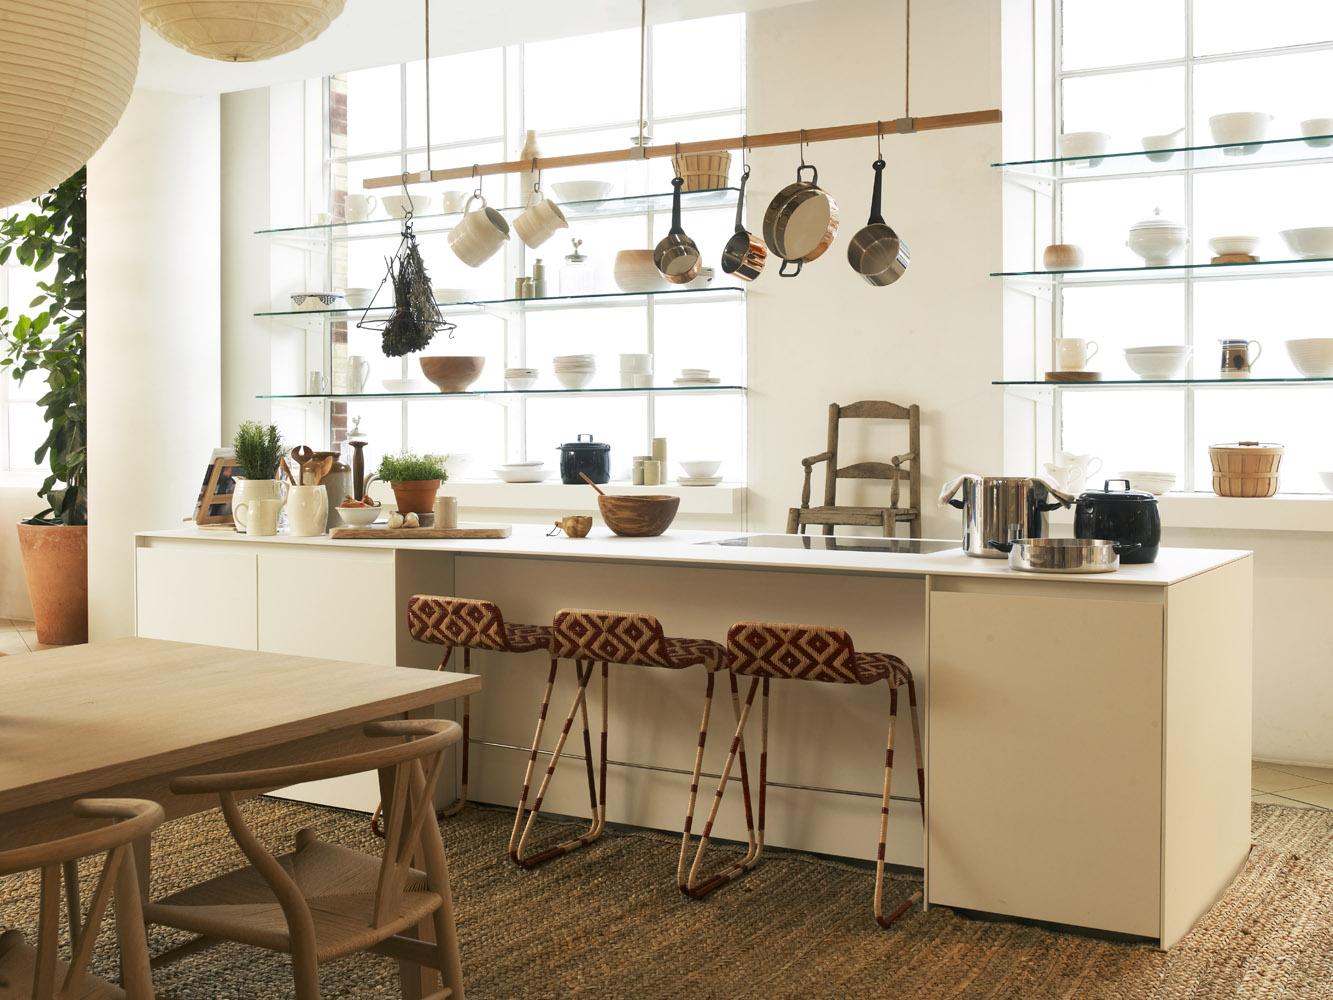 conran shop what 39 s going on at conran the conran blog. Black Bedroom Furniture Sets. Home Design Ideas